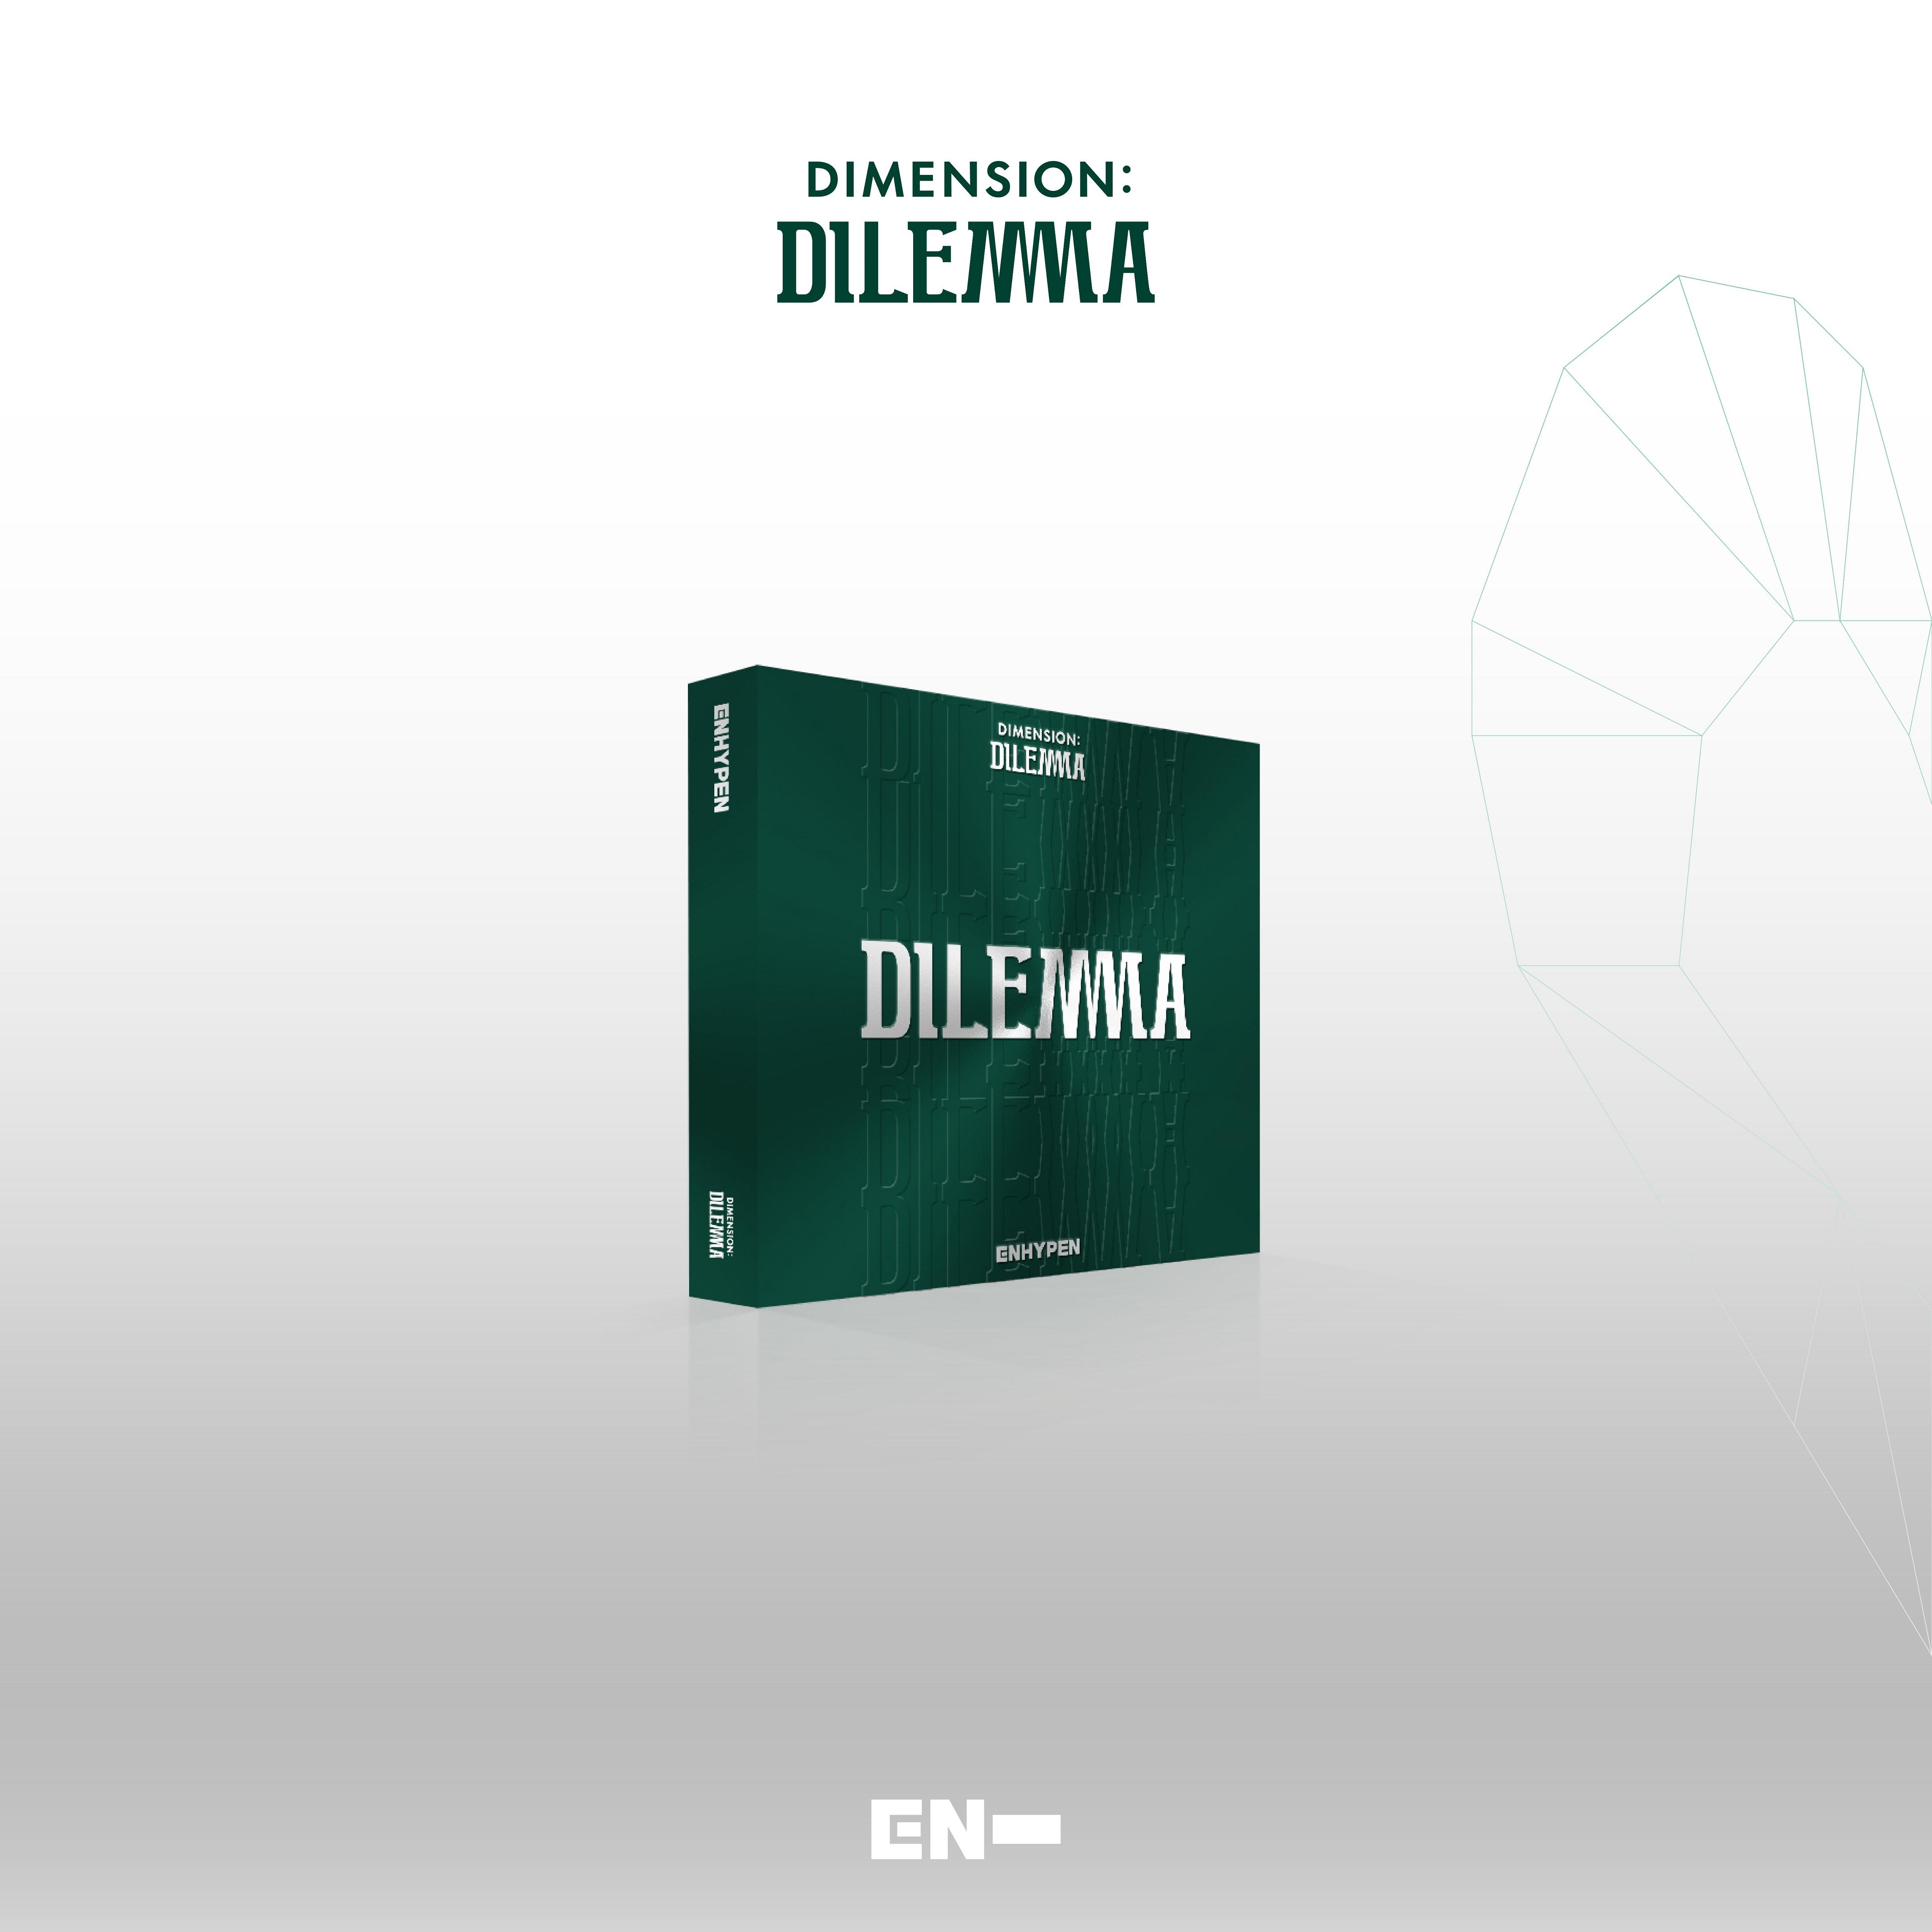 [thumb]DILEMMA_ESSENTIAL_0930